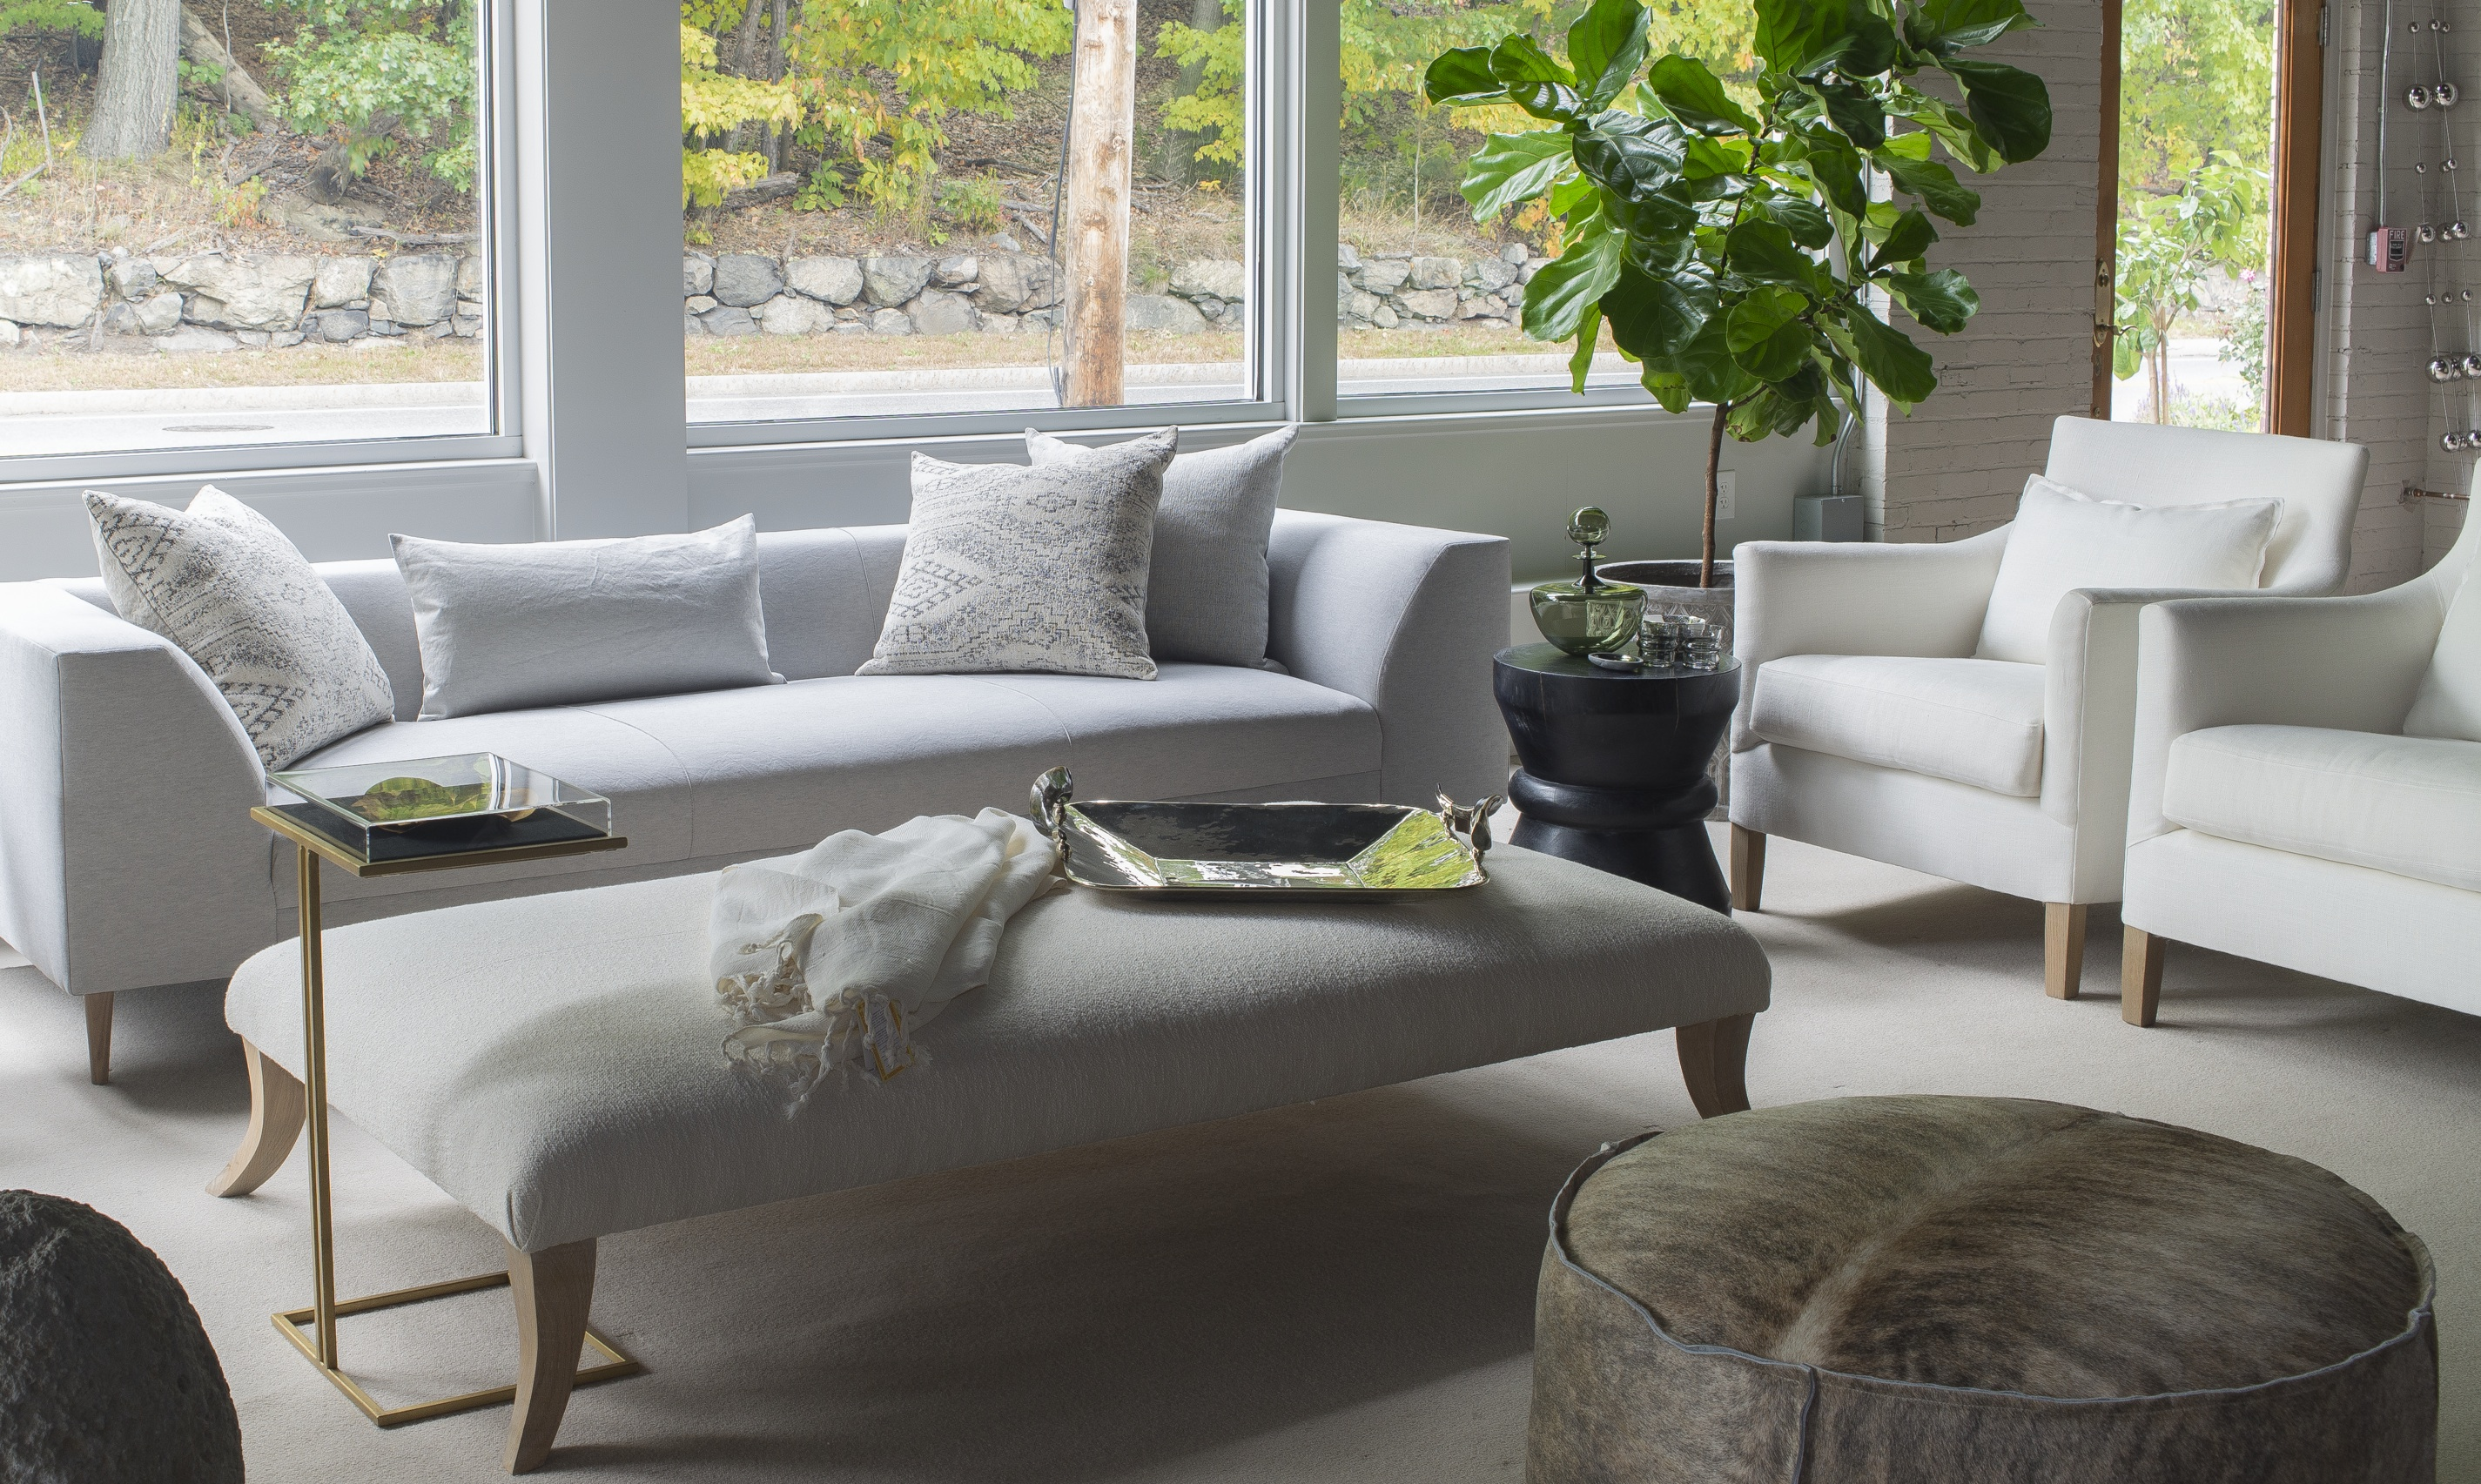 Image Result For Alison At Home Garden Furniture